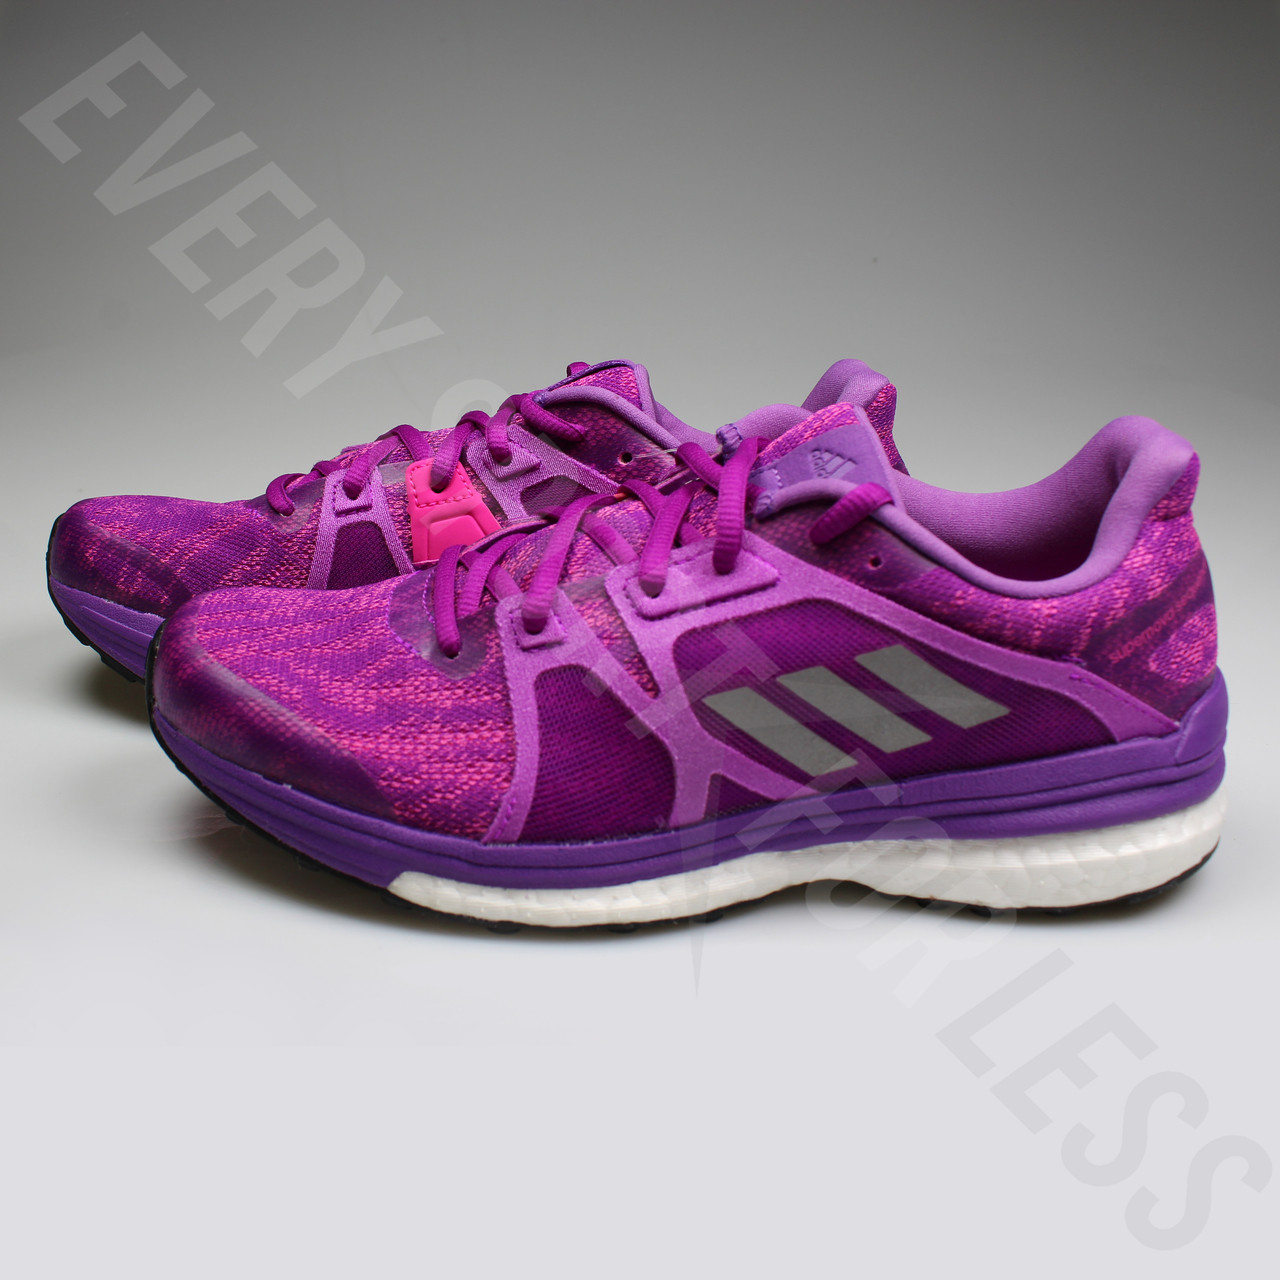 Adidas Supernova Sequence 9 Women's Running Shoes AQ3548 - Purple